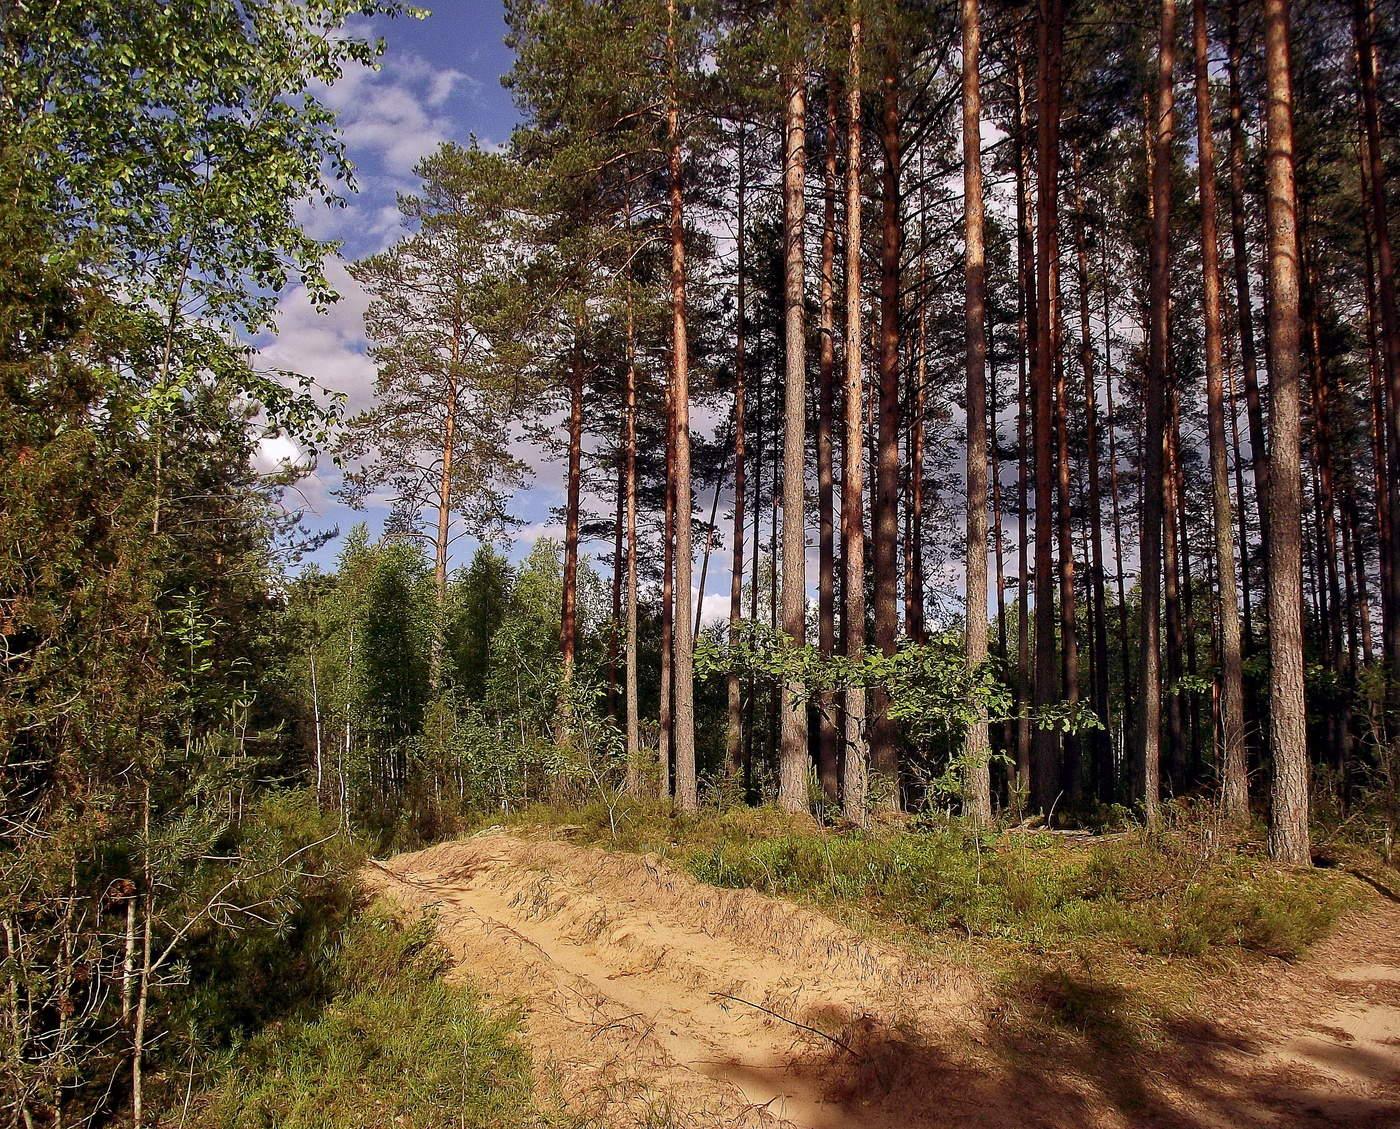 на опушке соснового леса фото фарингомикозом понимается